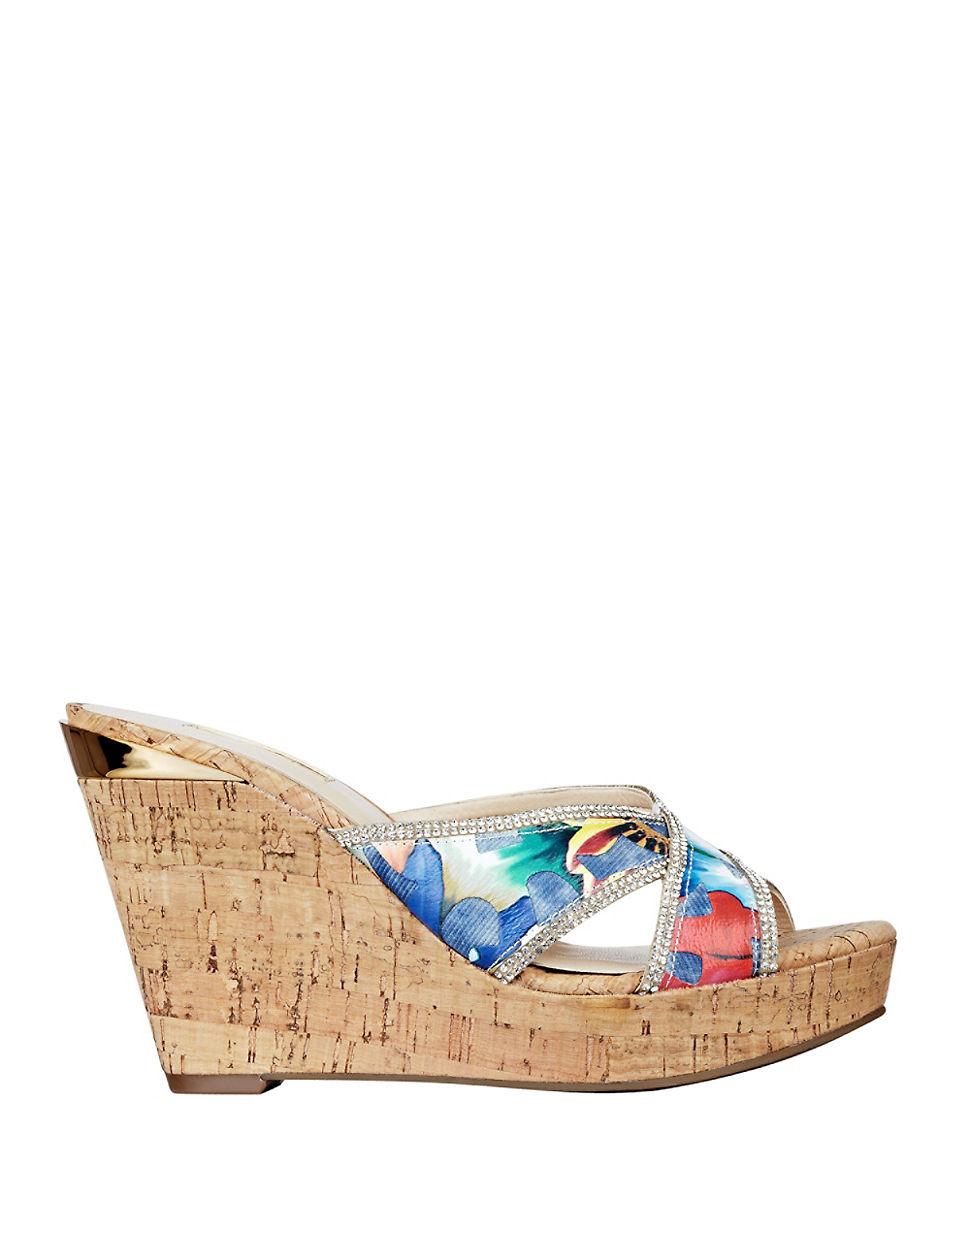 9b25b1e7fbfb Guess Eleonora Cork Platform Wedge Sandals in Blue - Lyst